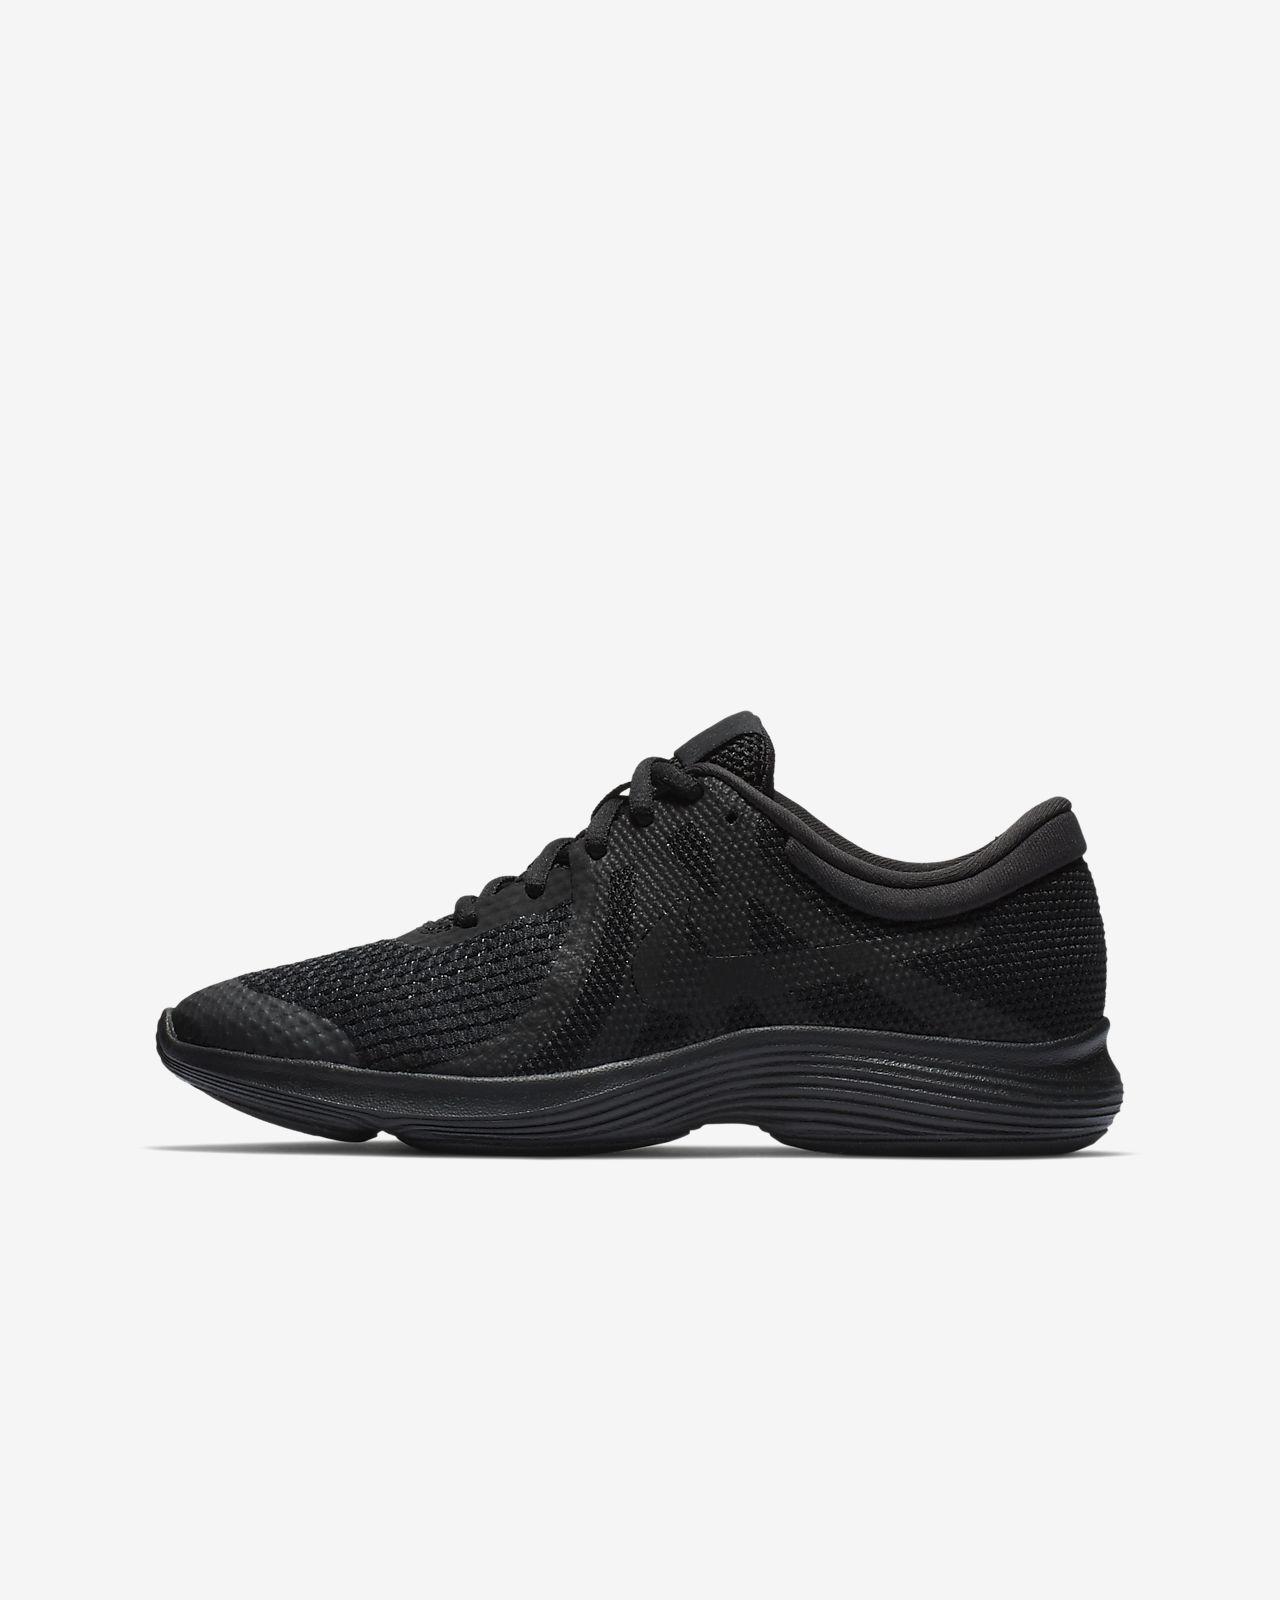 Sapatilhas de running Nike Revolution 4 Júnior